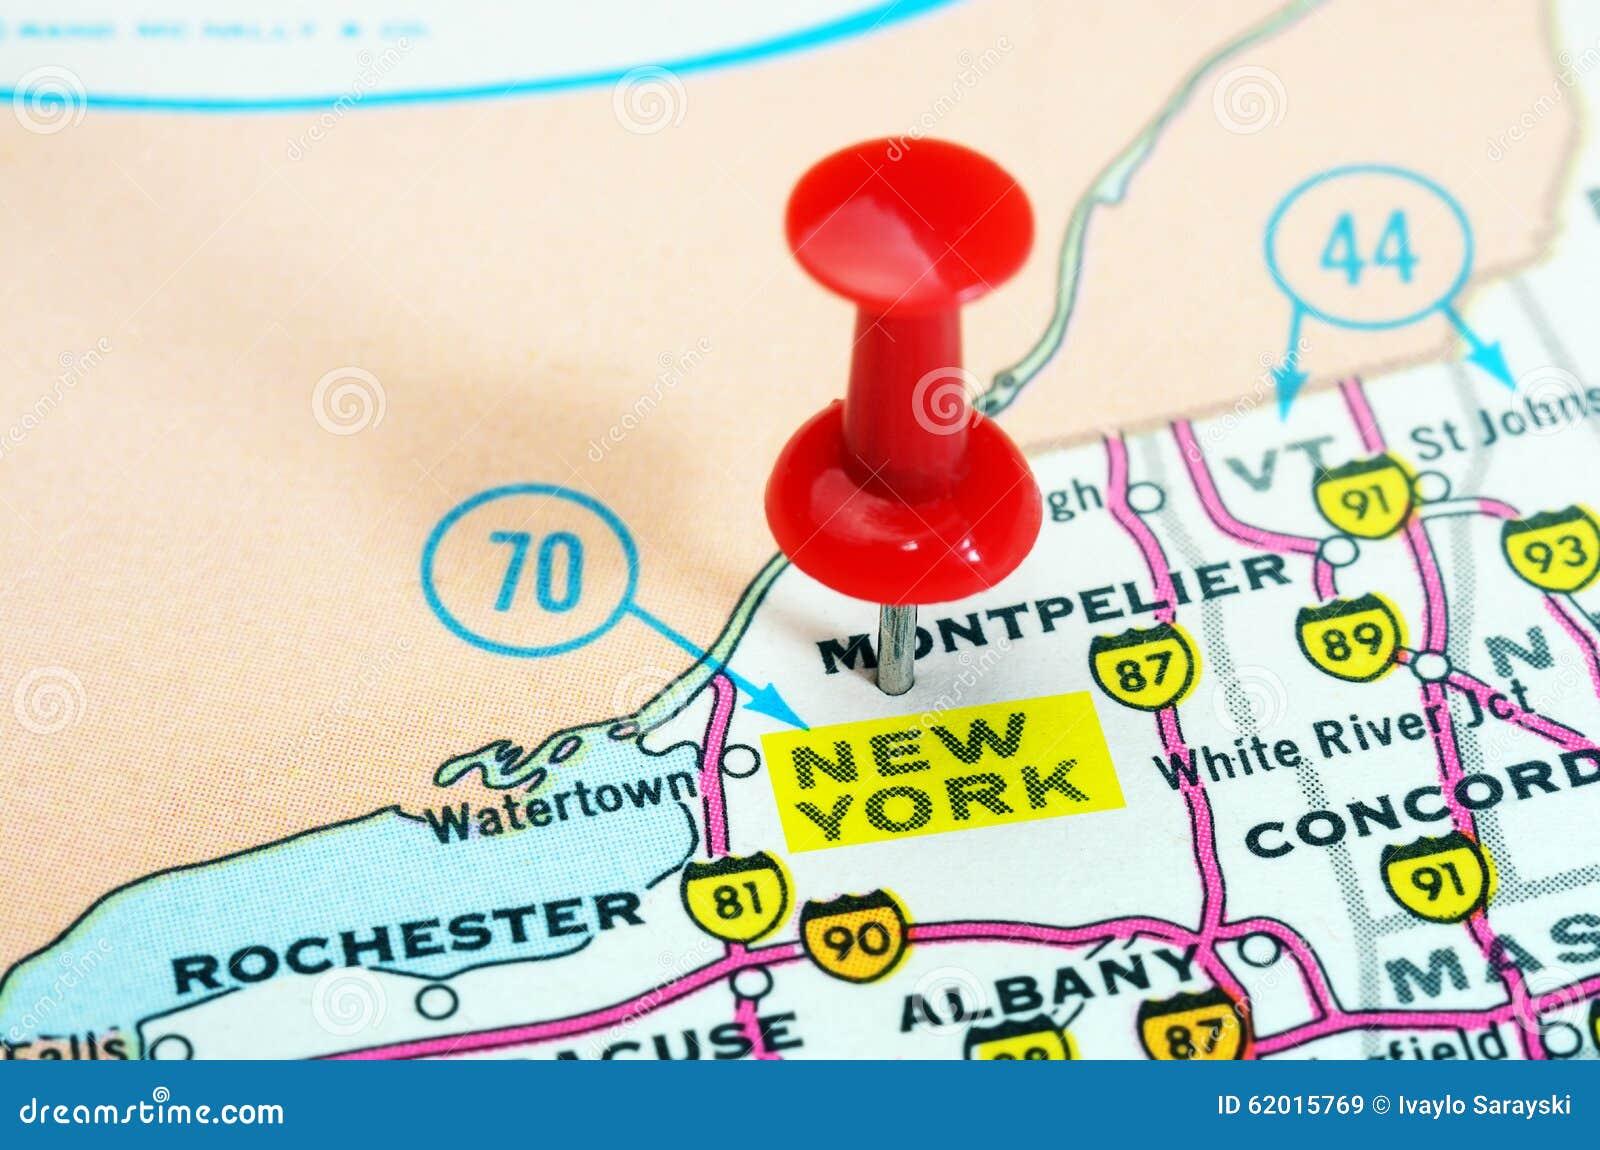 New York state USA map stock image. Image of watertown - 62015769 Map Of New York State Usa on religion map of usa, guam map of usa, jamaica map of usa, rhode island, washington dc map of usa, new york city, new jersey, north carolina, united states of america, las vegas map of usa, los angeles, new england map of usa, hudson river map of usa, statue of liberty, niagara falls map of usa,